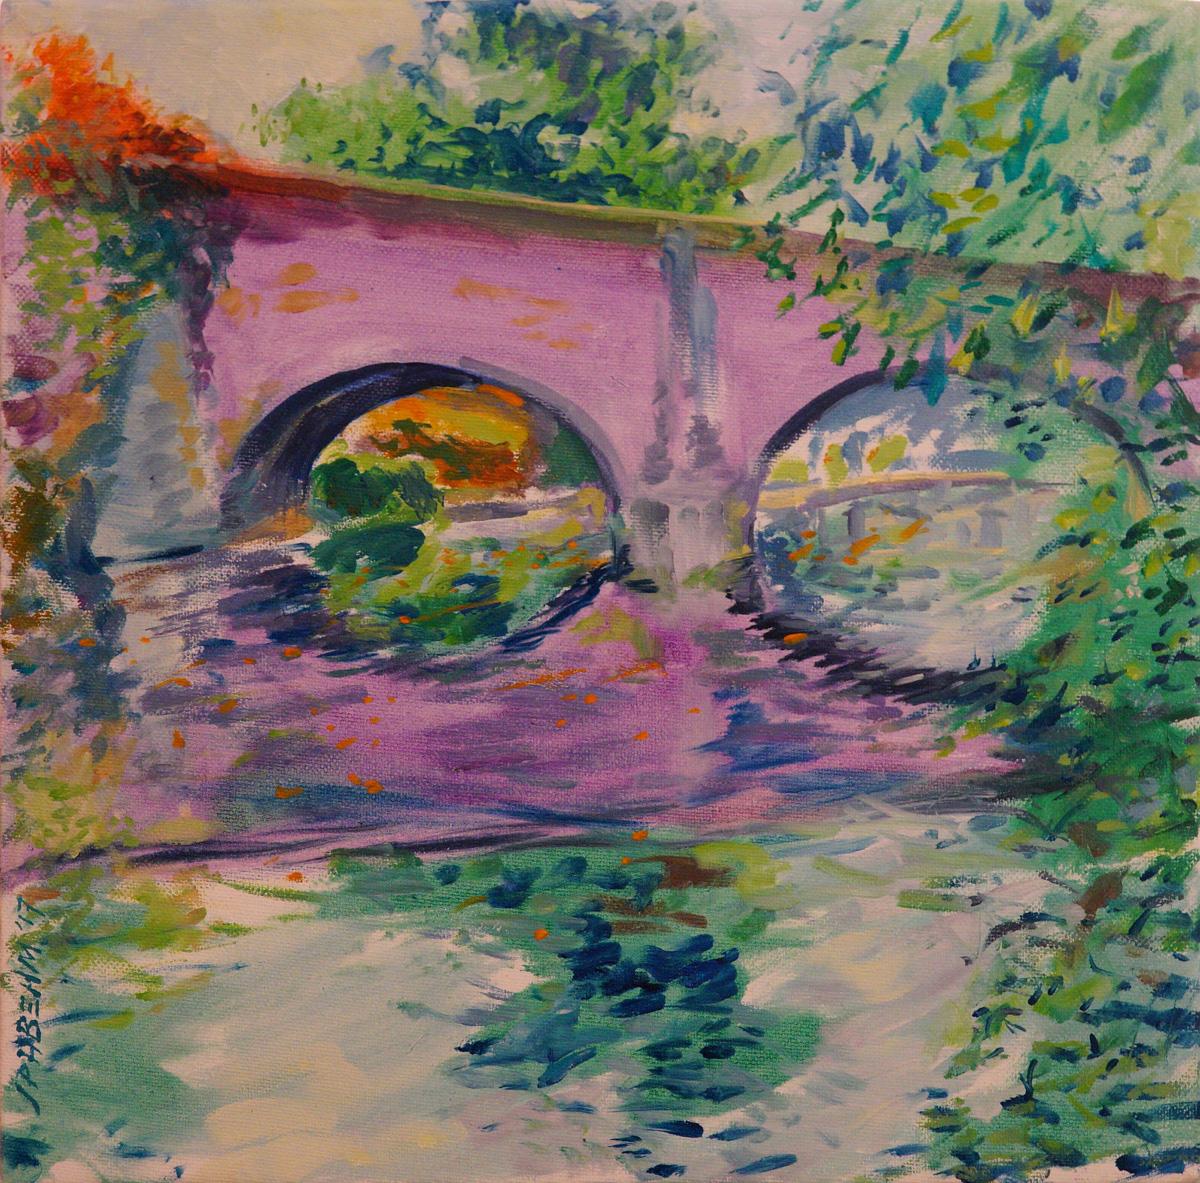 Artist John Behm, 'Sun-Hazed October Morn in Violet', Bishop Bridge, Oil, 12x12in, £320. Photo © Katy Jon Went